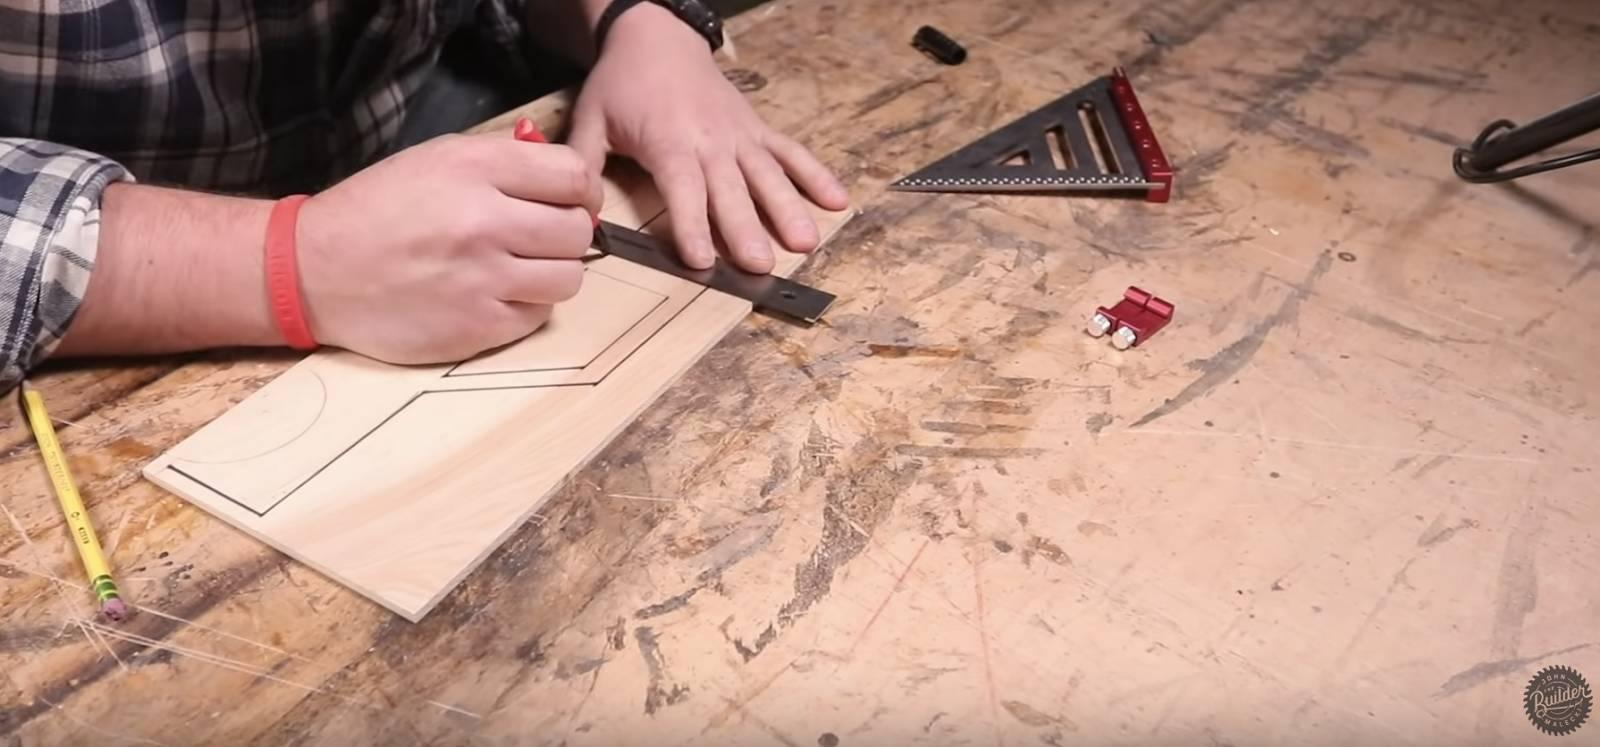 John malecki makes the template for wooden toy trucks